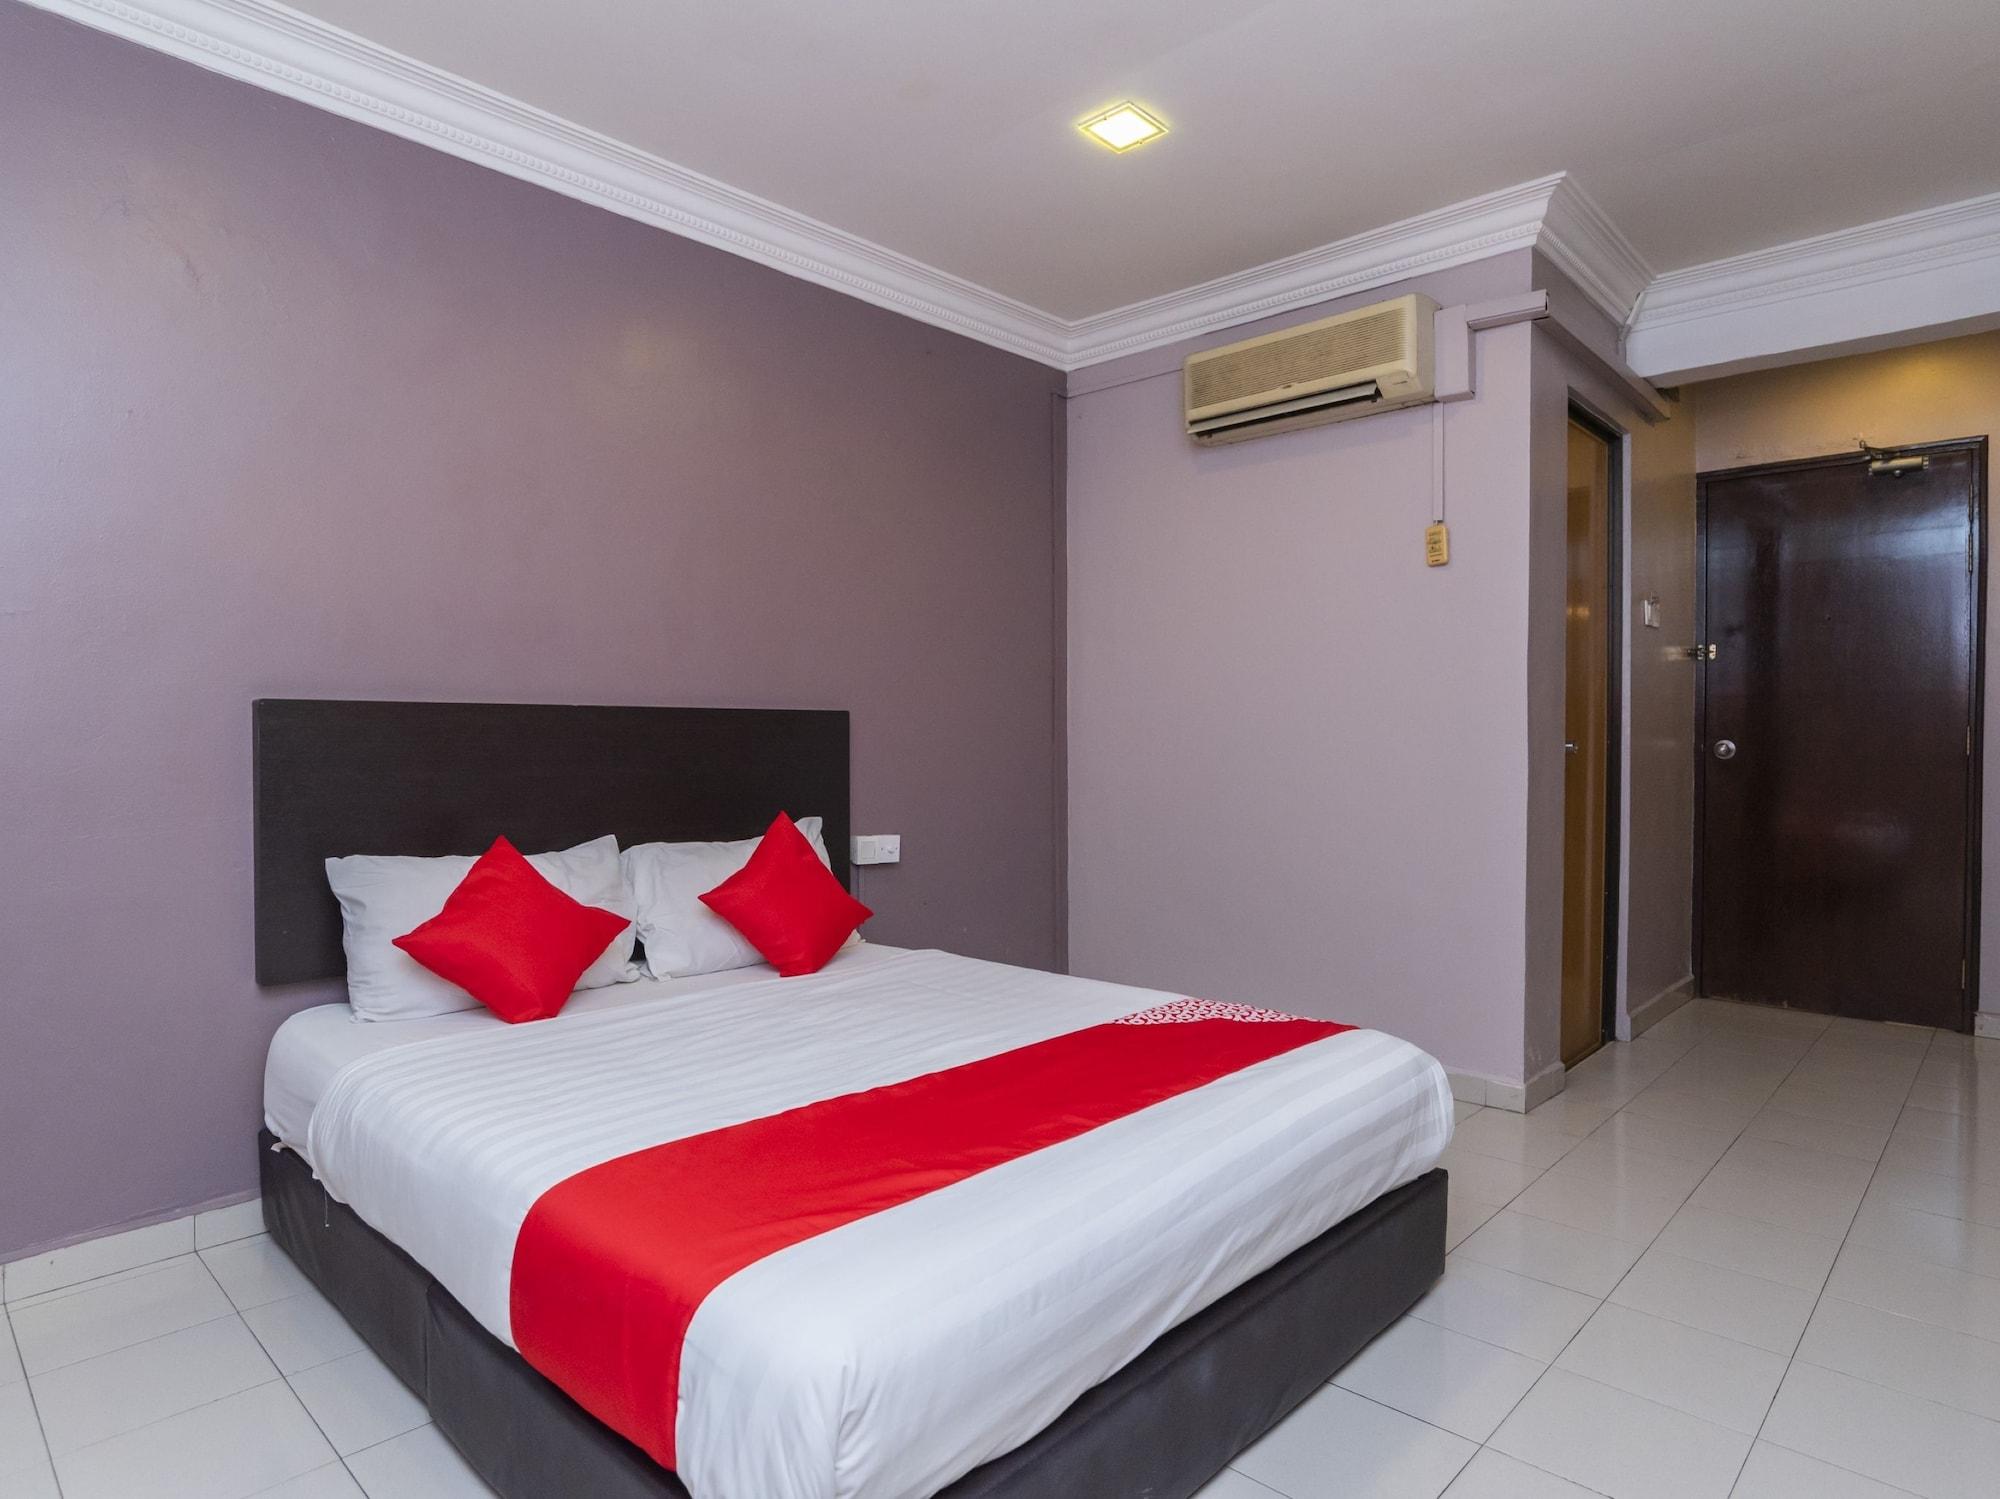 OYO 44027 Golden Horse Hotel, Johor Bahru